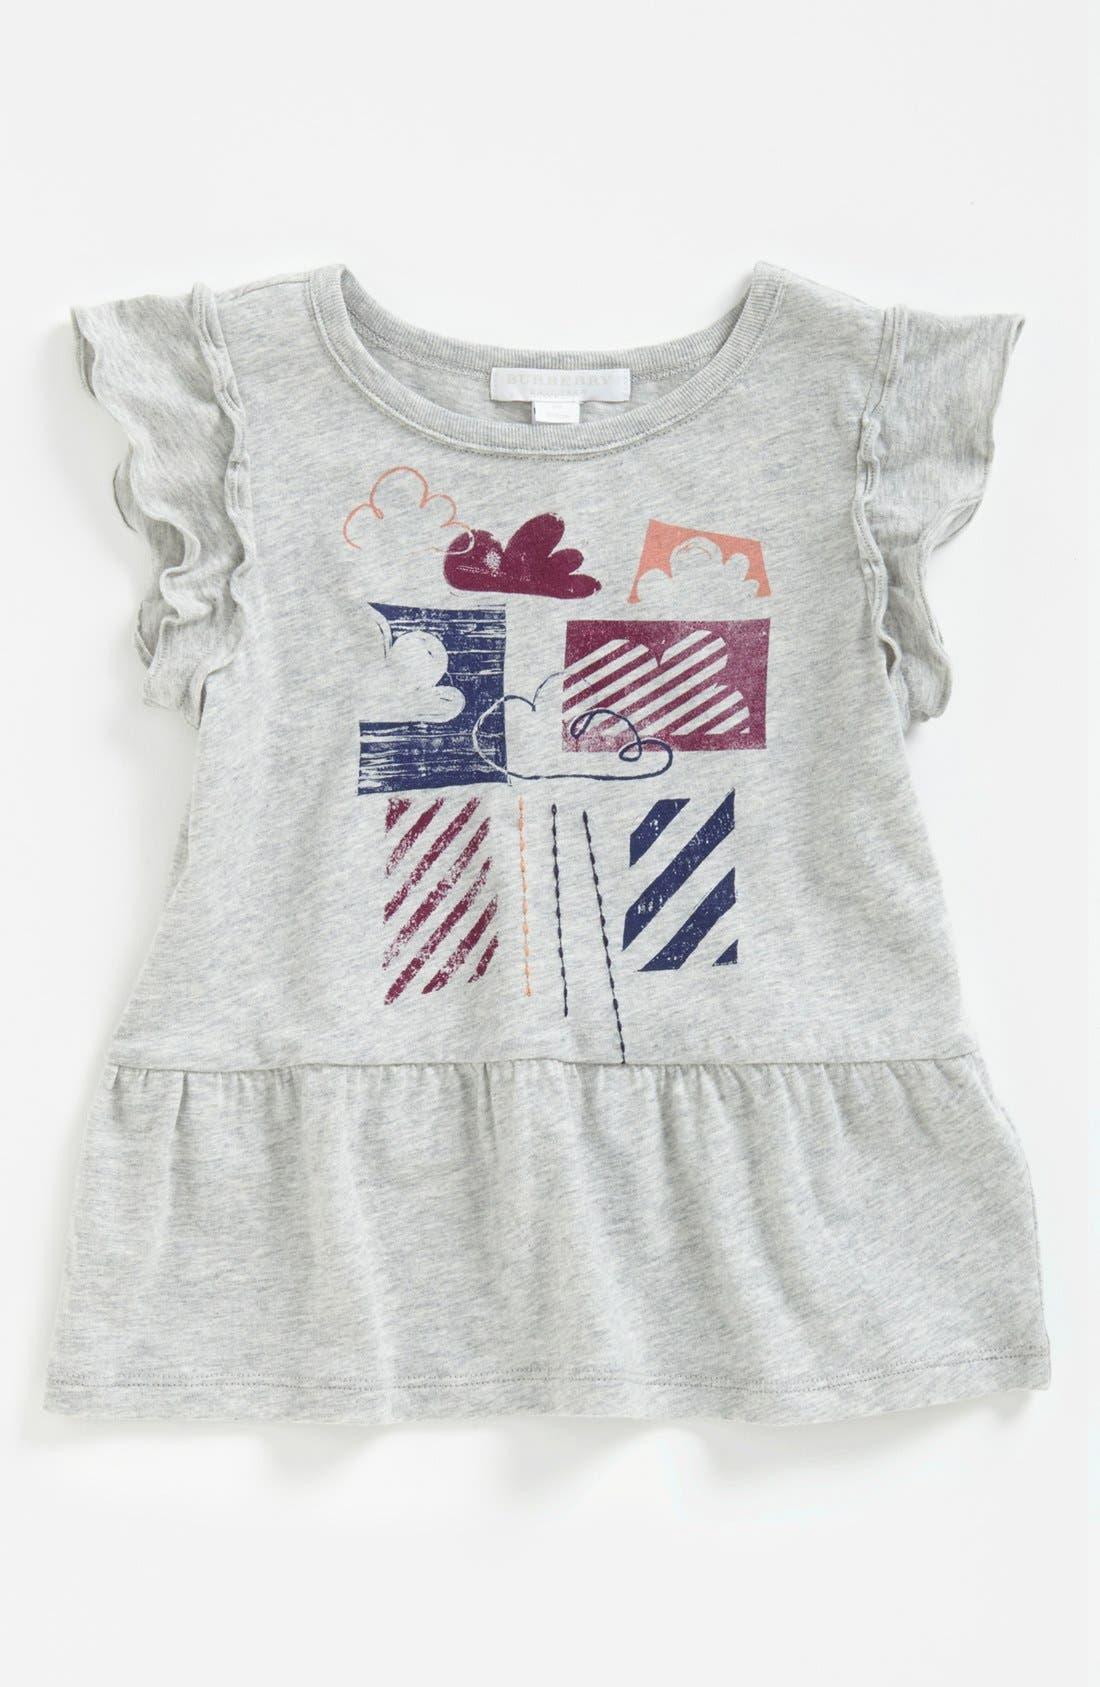 Main Image - Burberry 'Cloudy' Peplum Ruffle Top (Toddler Girls, Little Girls & Big Girls)